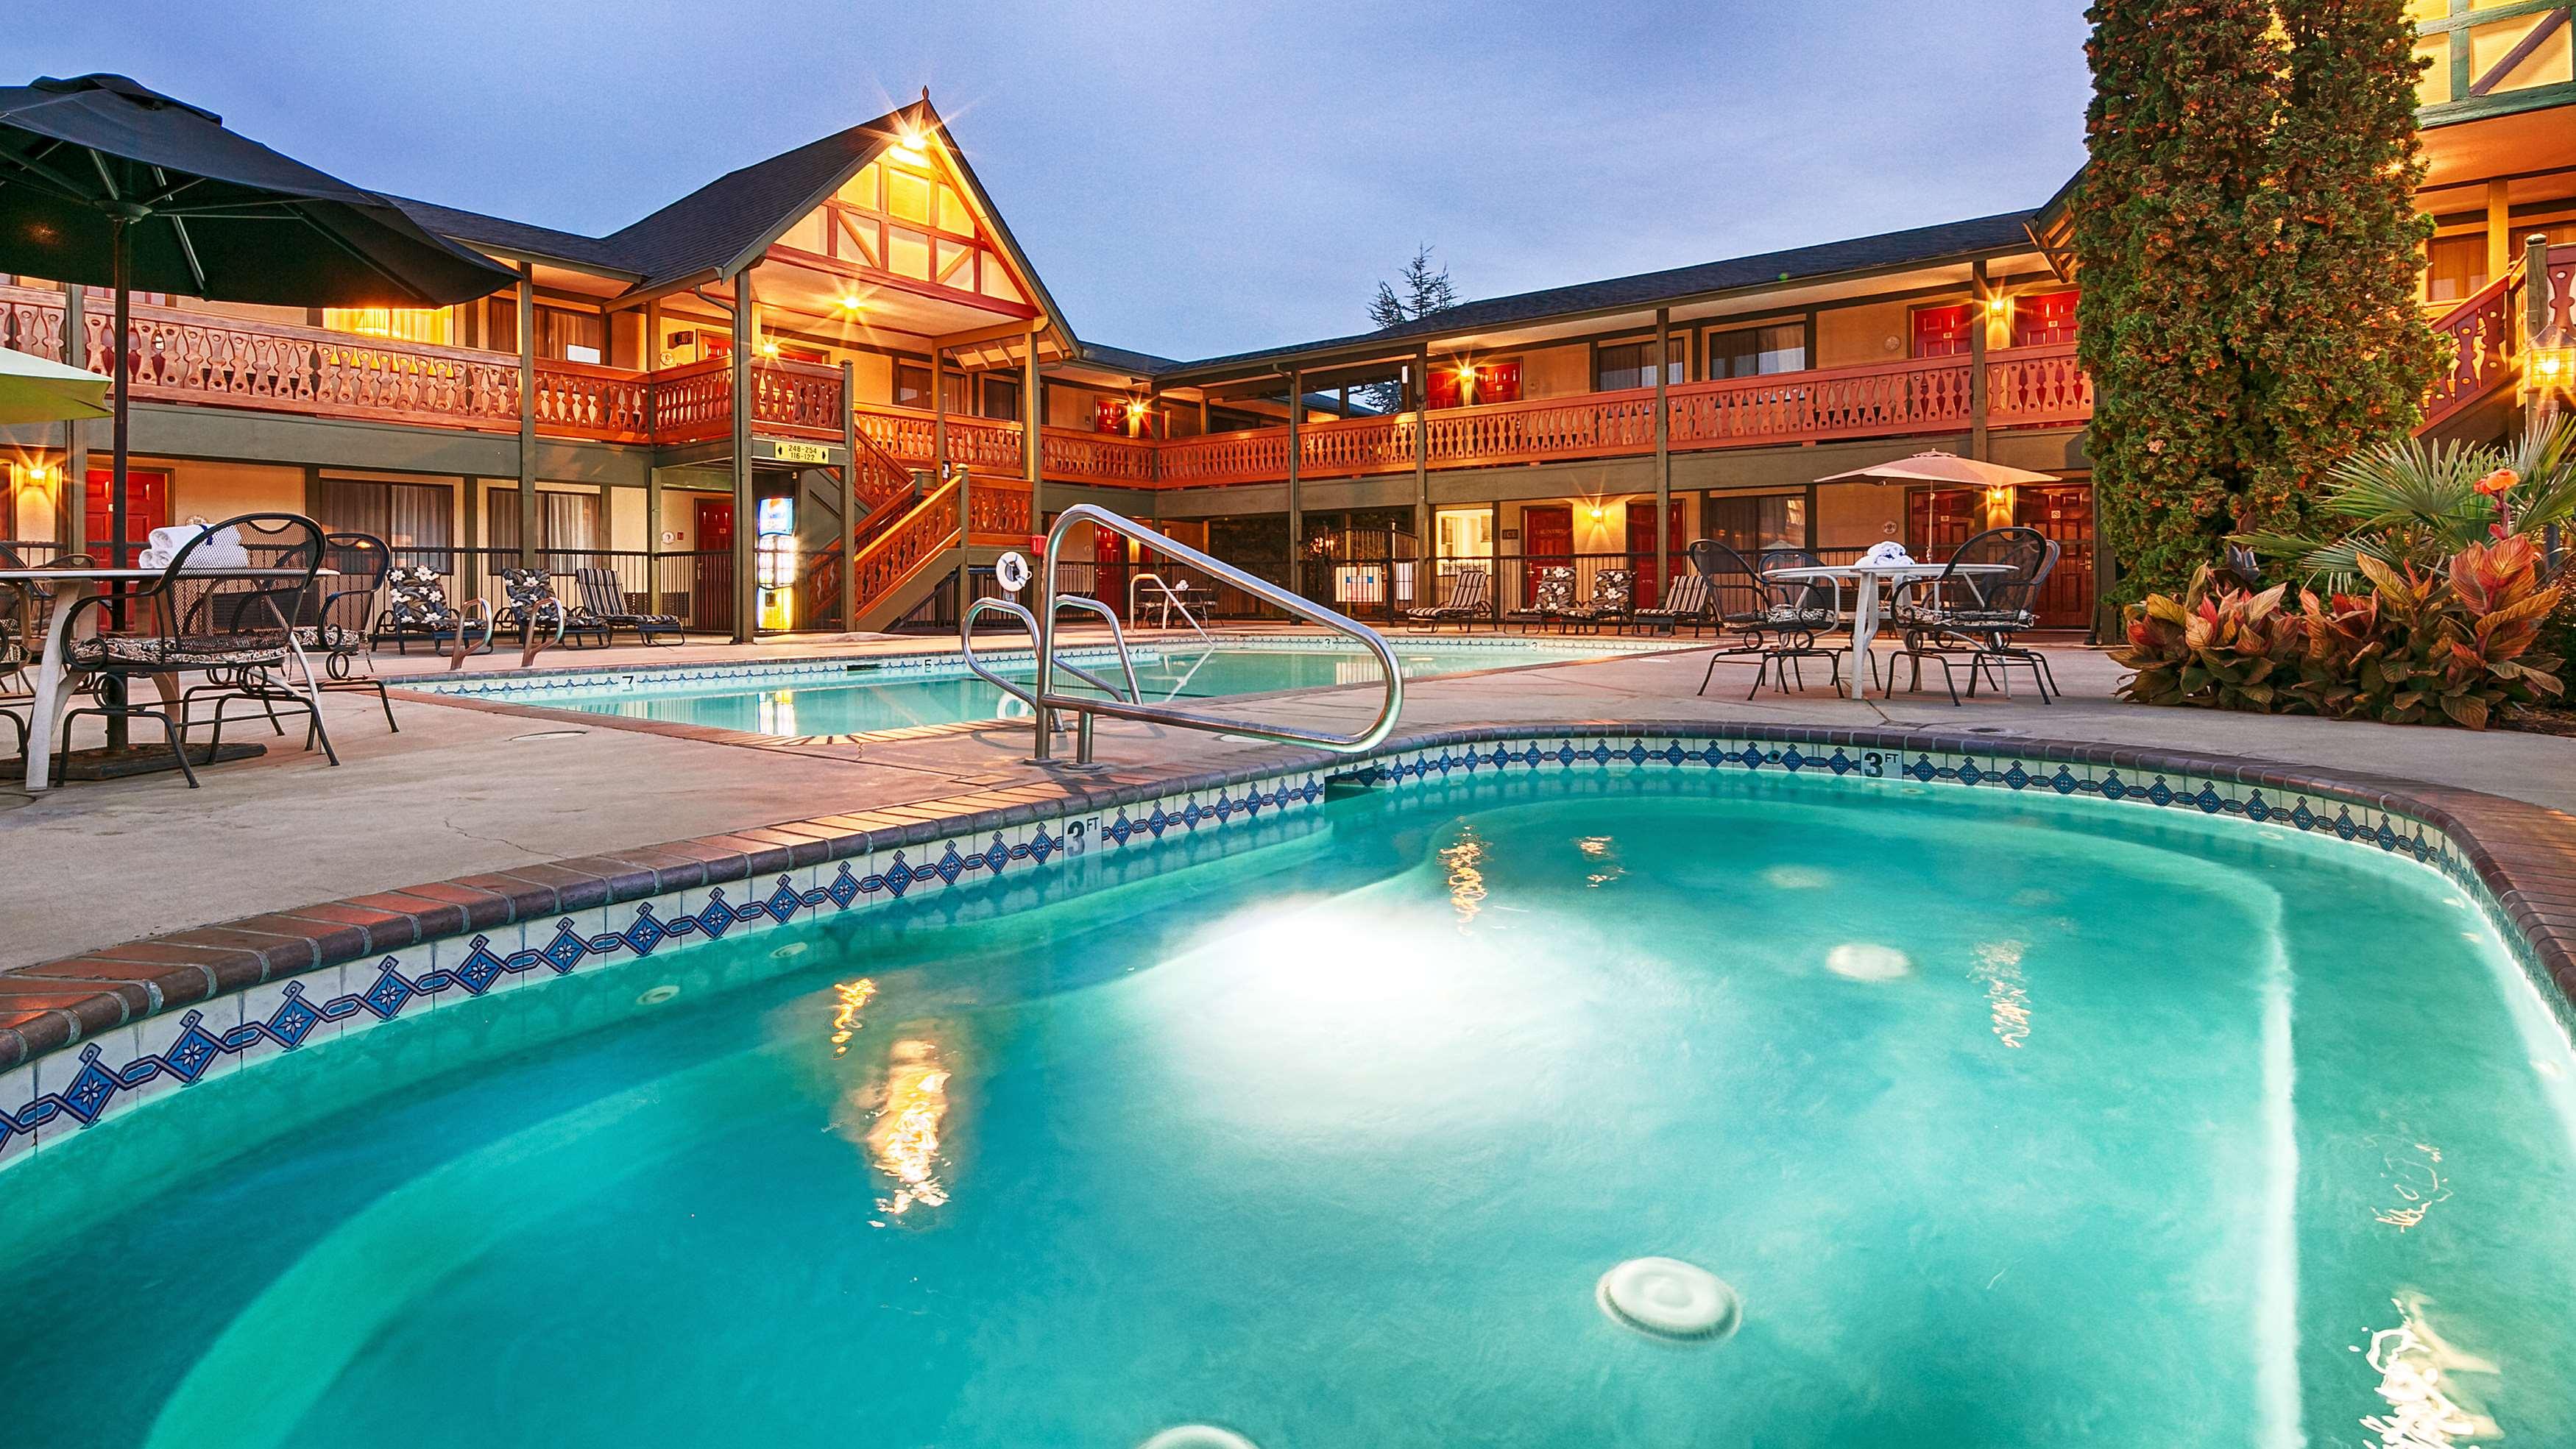 Best Western Windsor Inn image 0